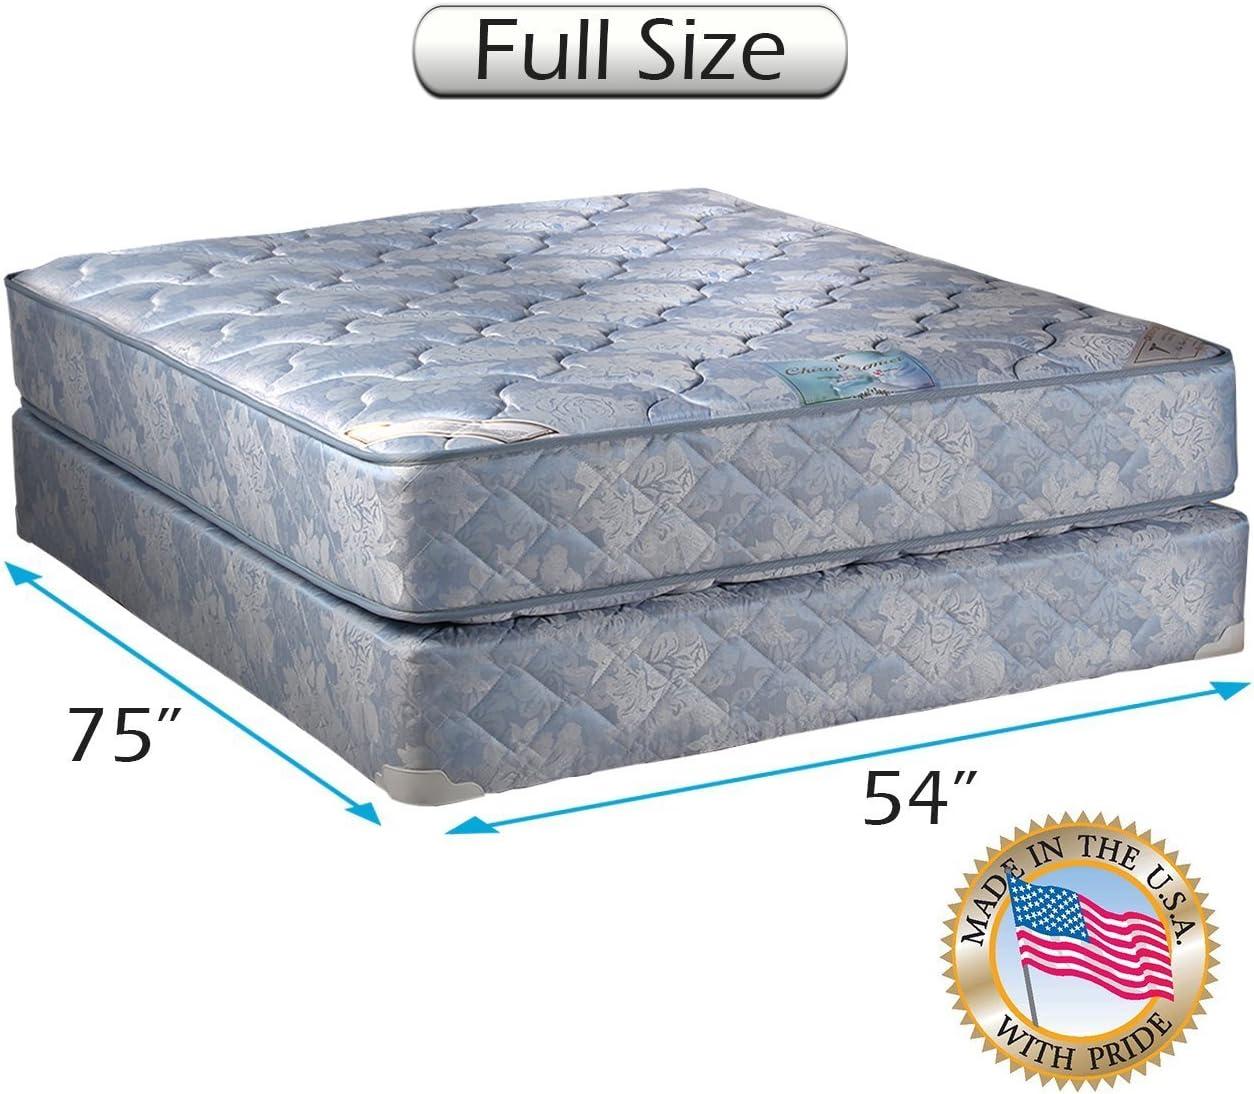 Amazon.com: Dream Sleep Chiro Premier Two-Sided Mattress Set - Bed